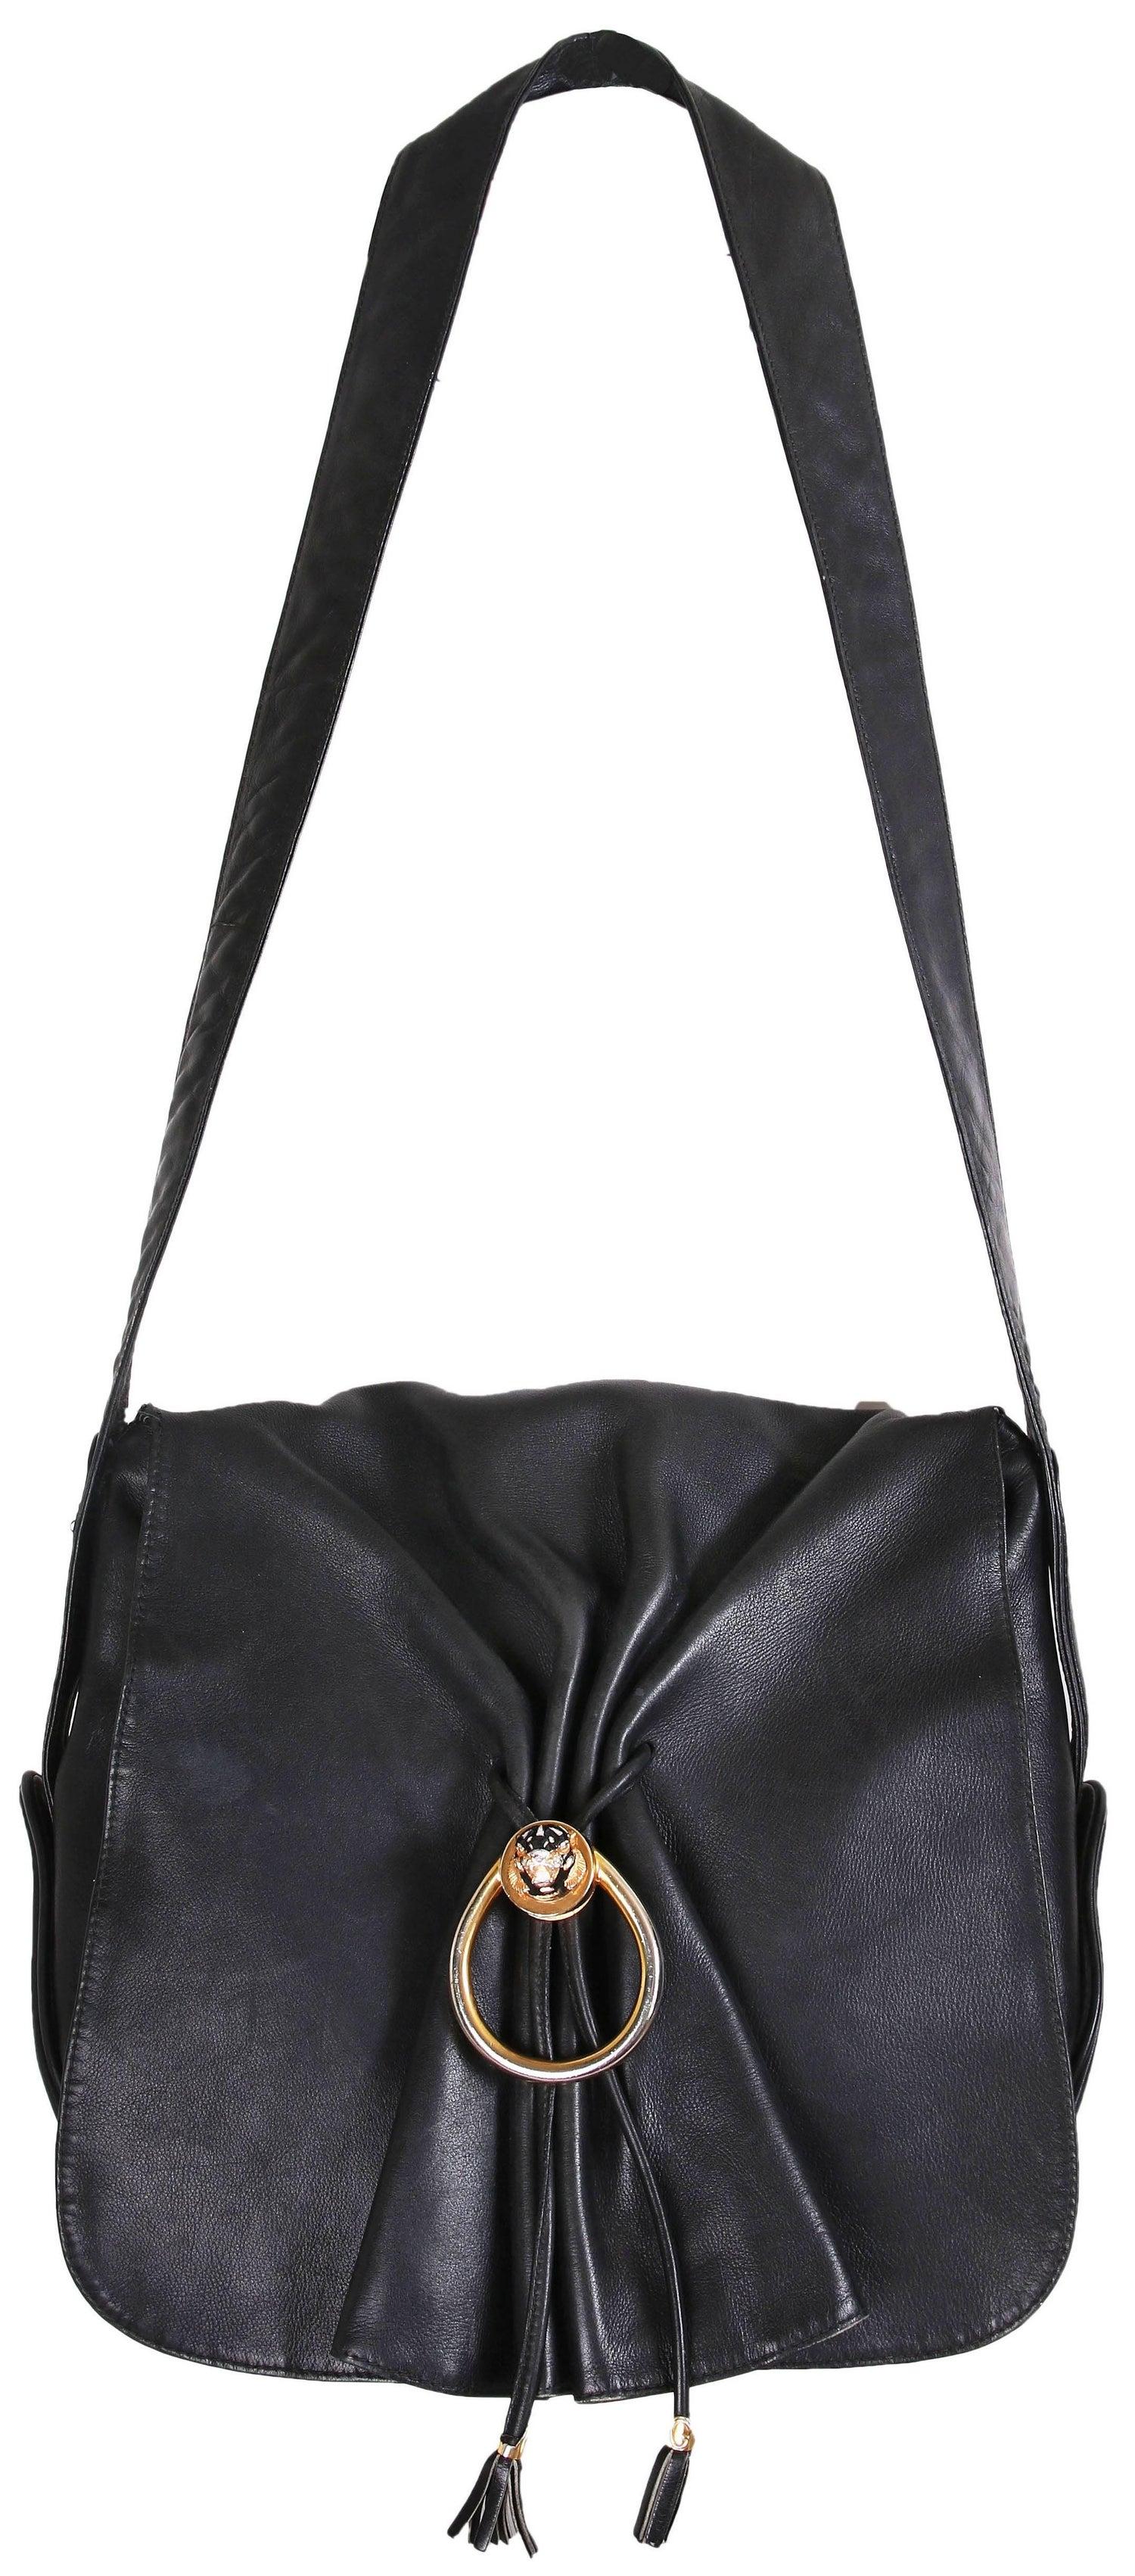 f65f48037 Vintage Gucci Black Leather Bag w/Flap Closure and Enamel Tiger Head Door  Knocker at 1stdibs